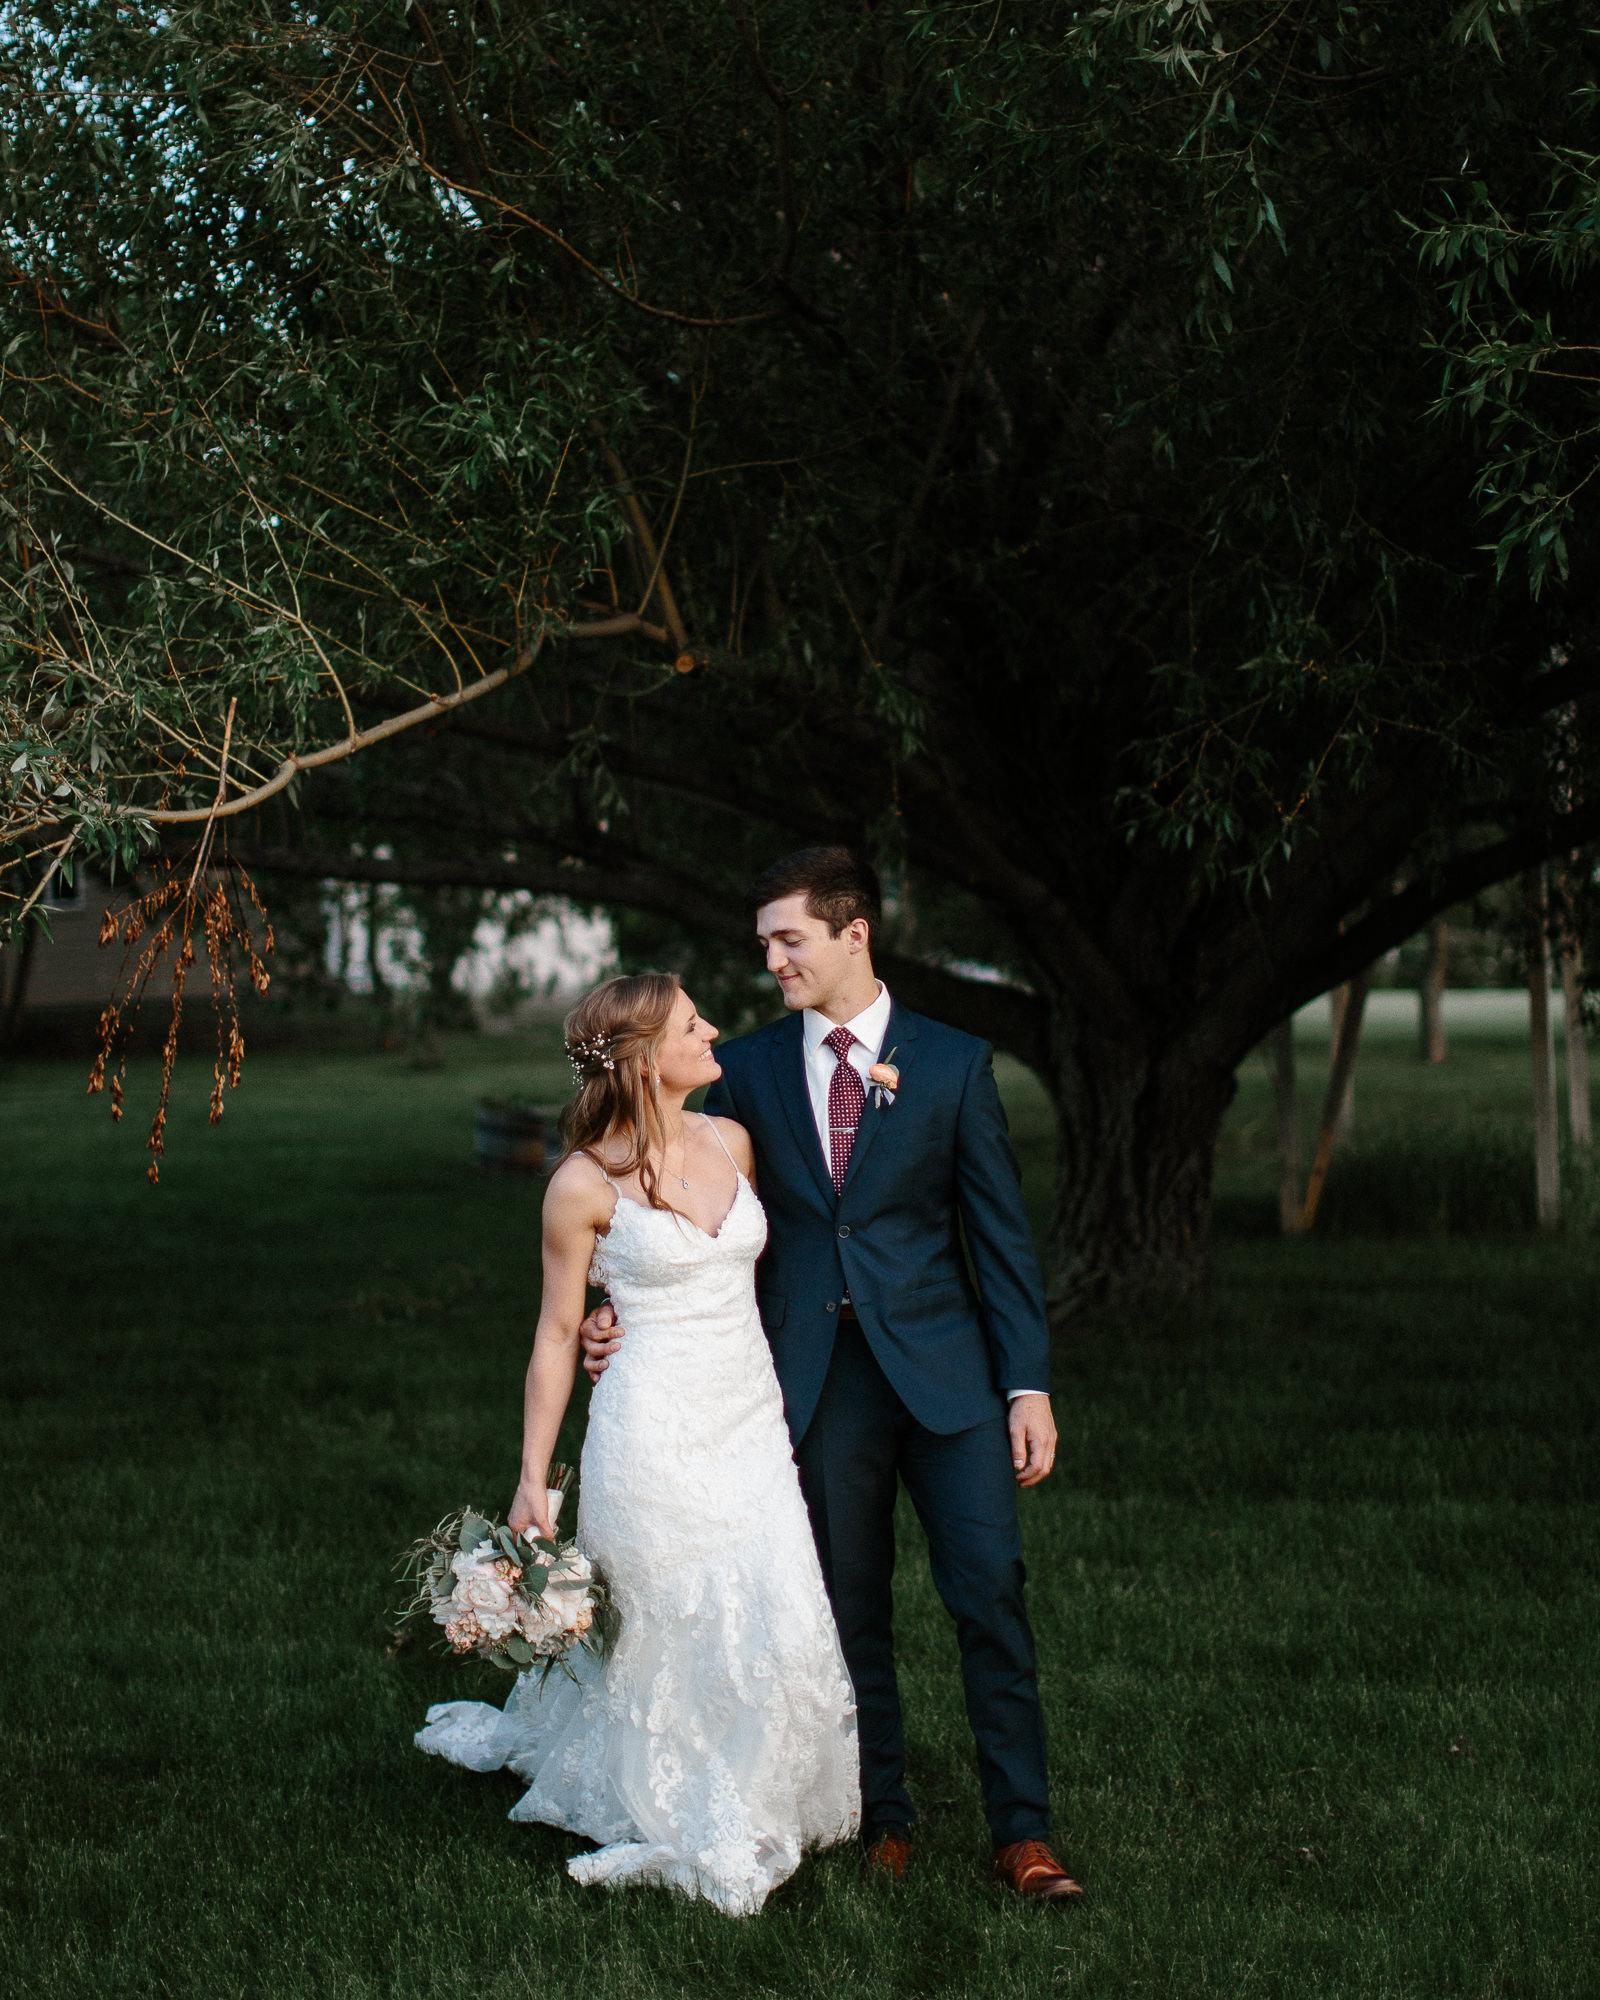 wedding-elopement-adventerous-romantic-timeless-south-dakota-blue-haven-barn-084.jpg